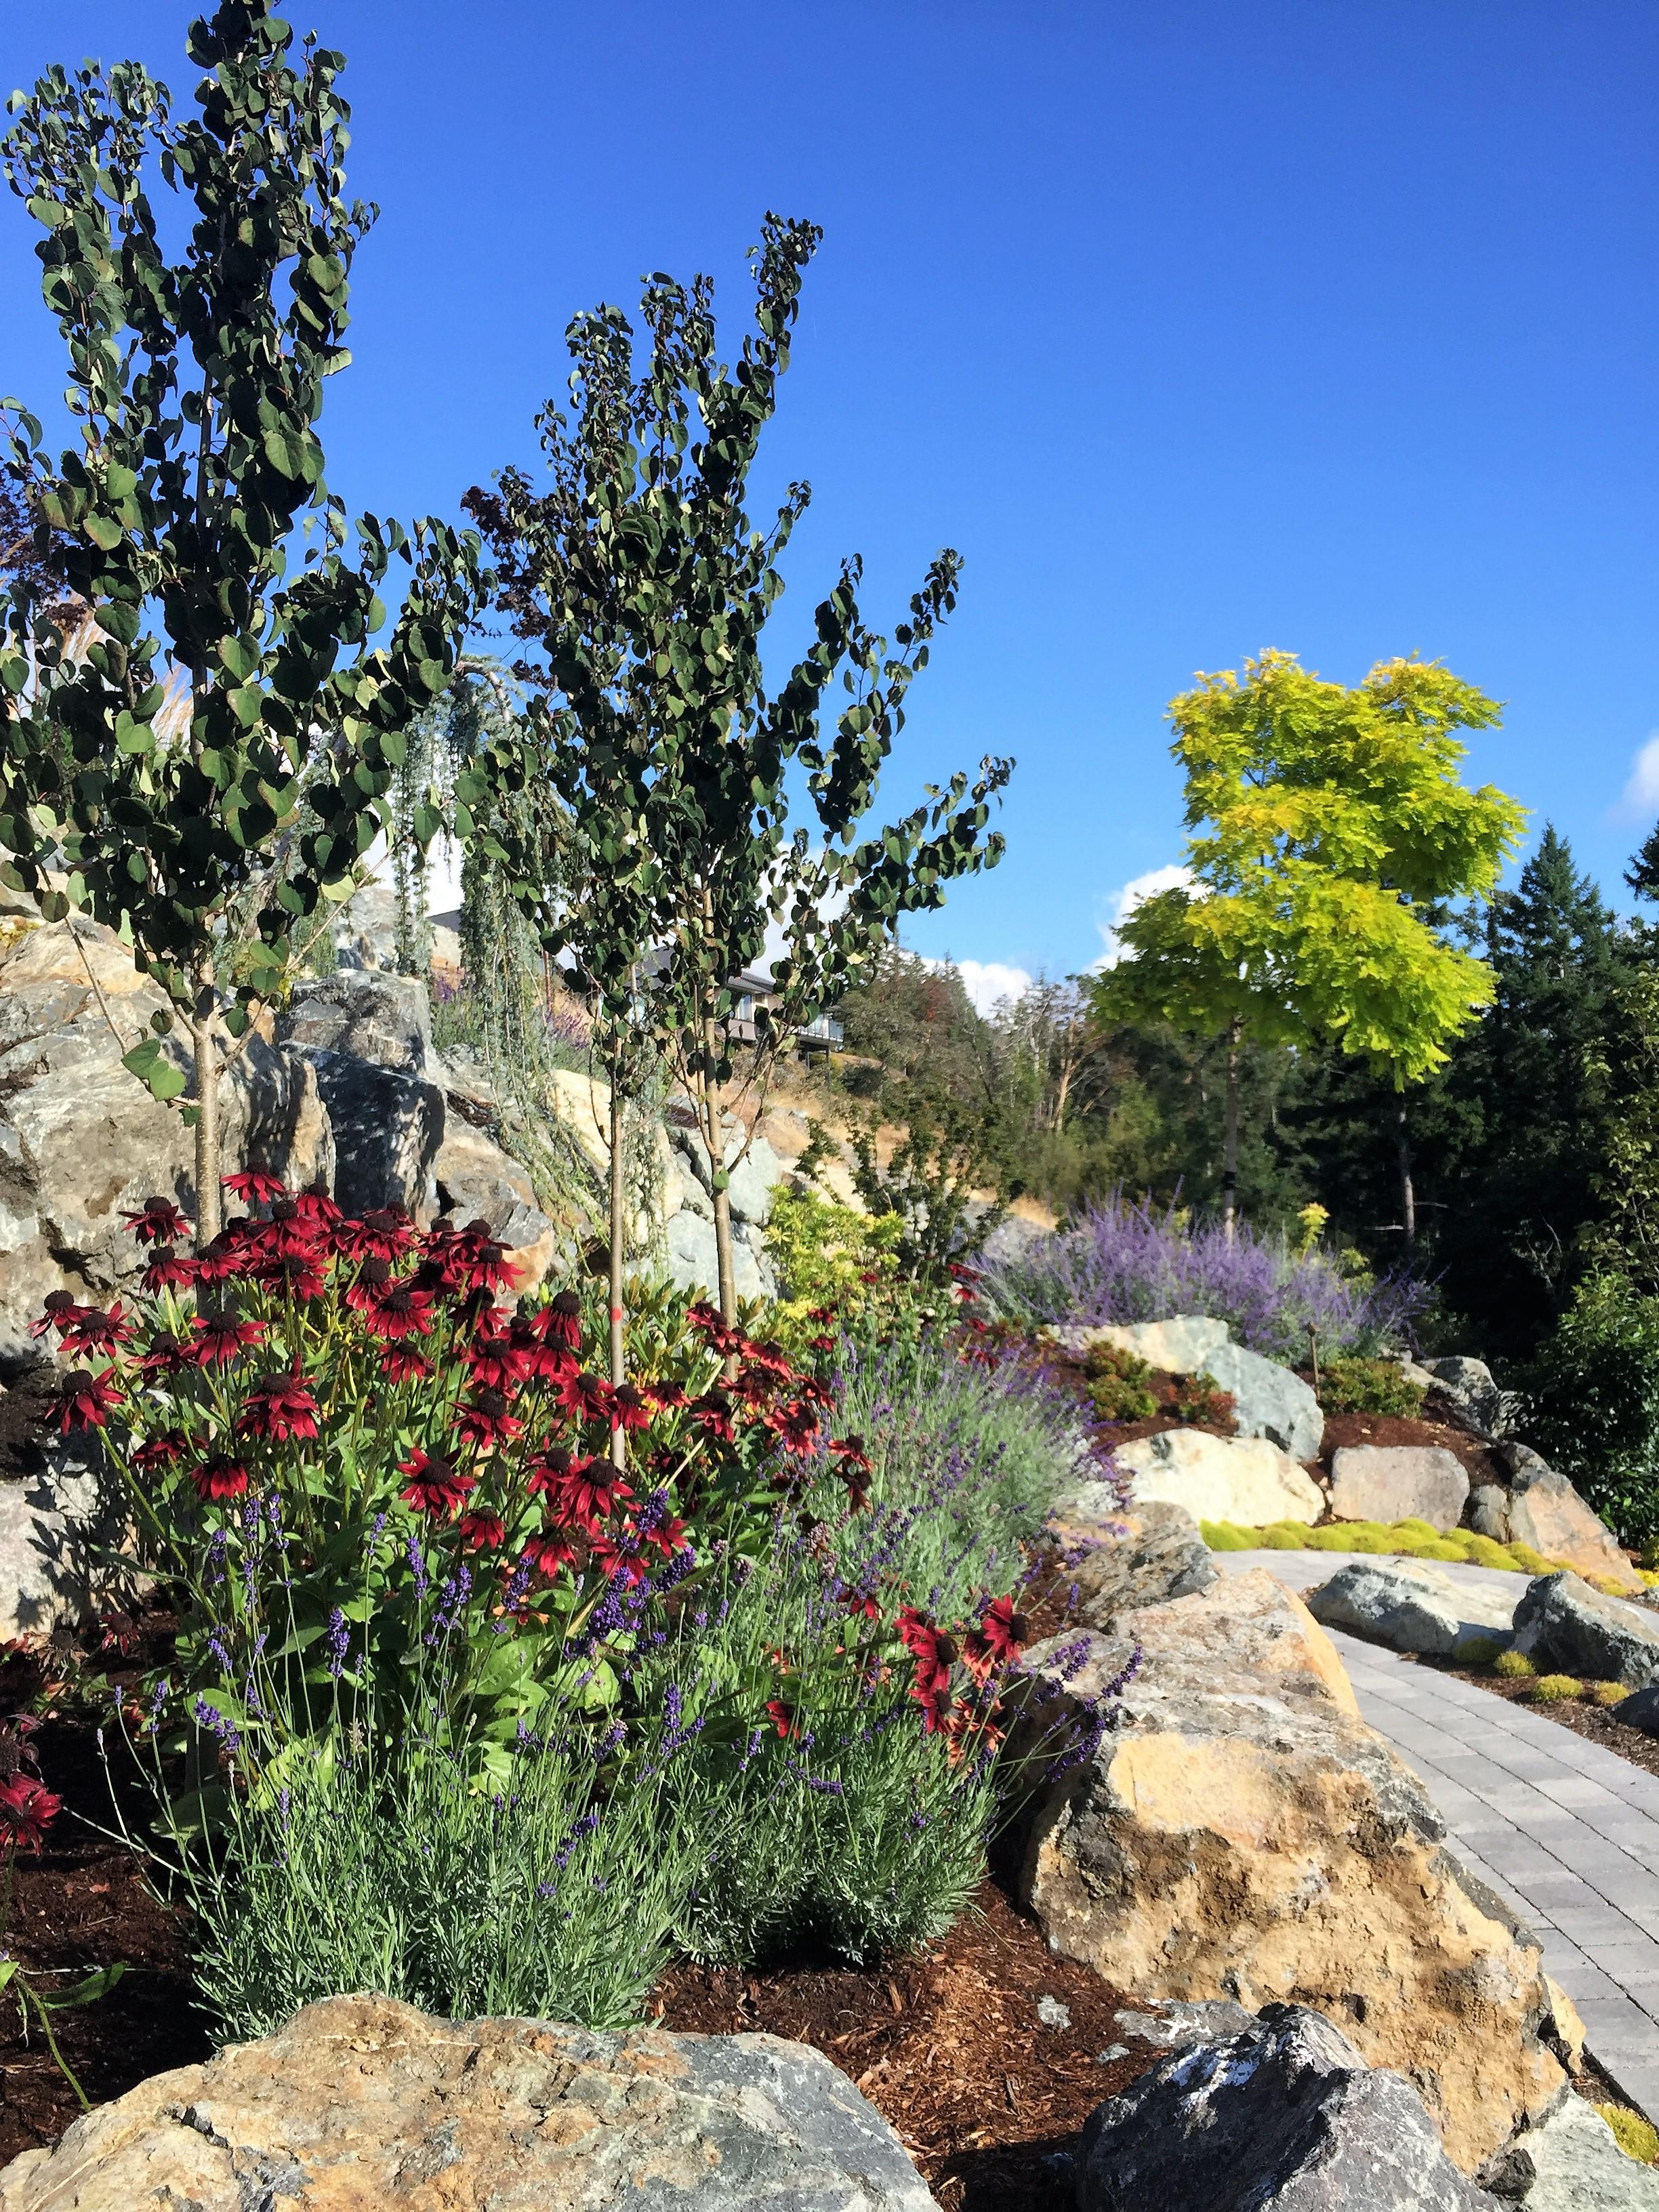 MustangLandscape-BC-Victoria-Garden-rockwall-rudbeckia-boulderwall.jpg